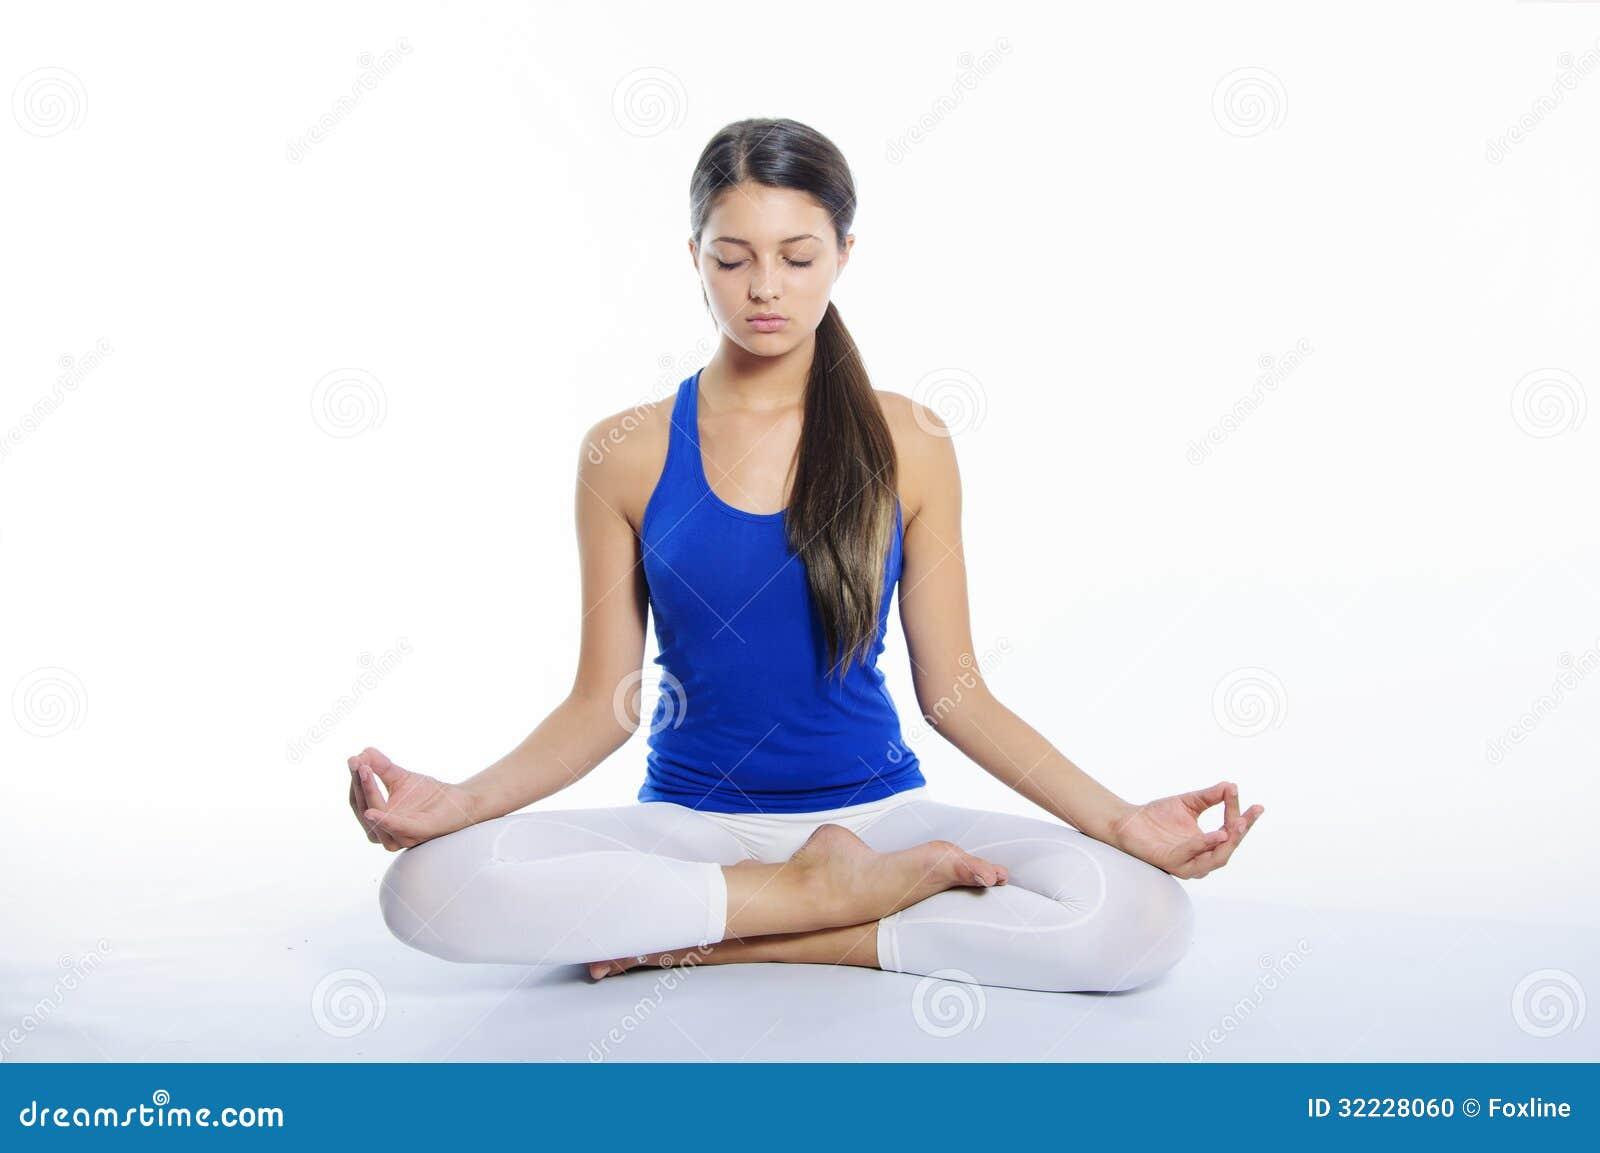 Yoga Girl On A White Background Stock Photo - Image: 32228060